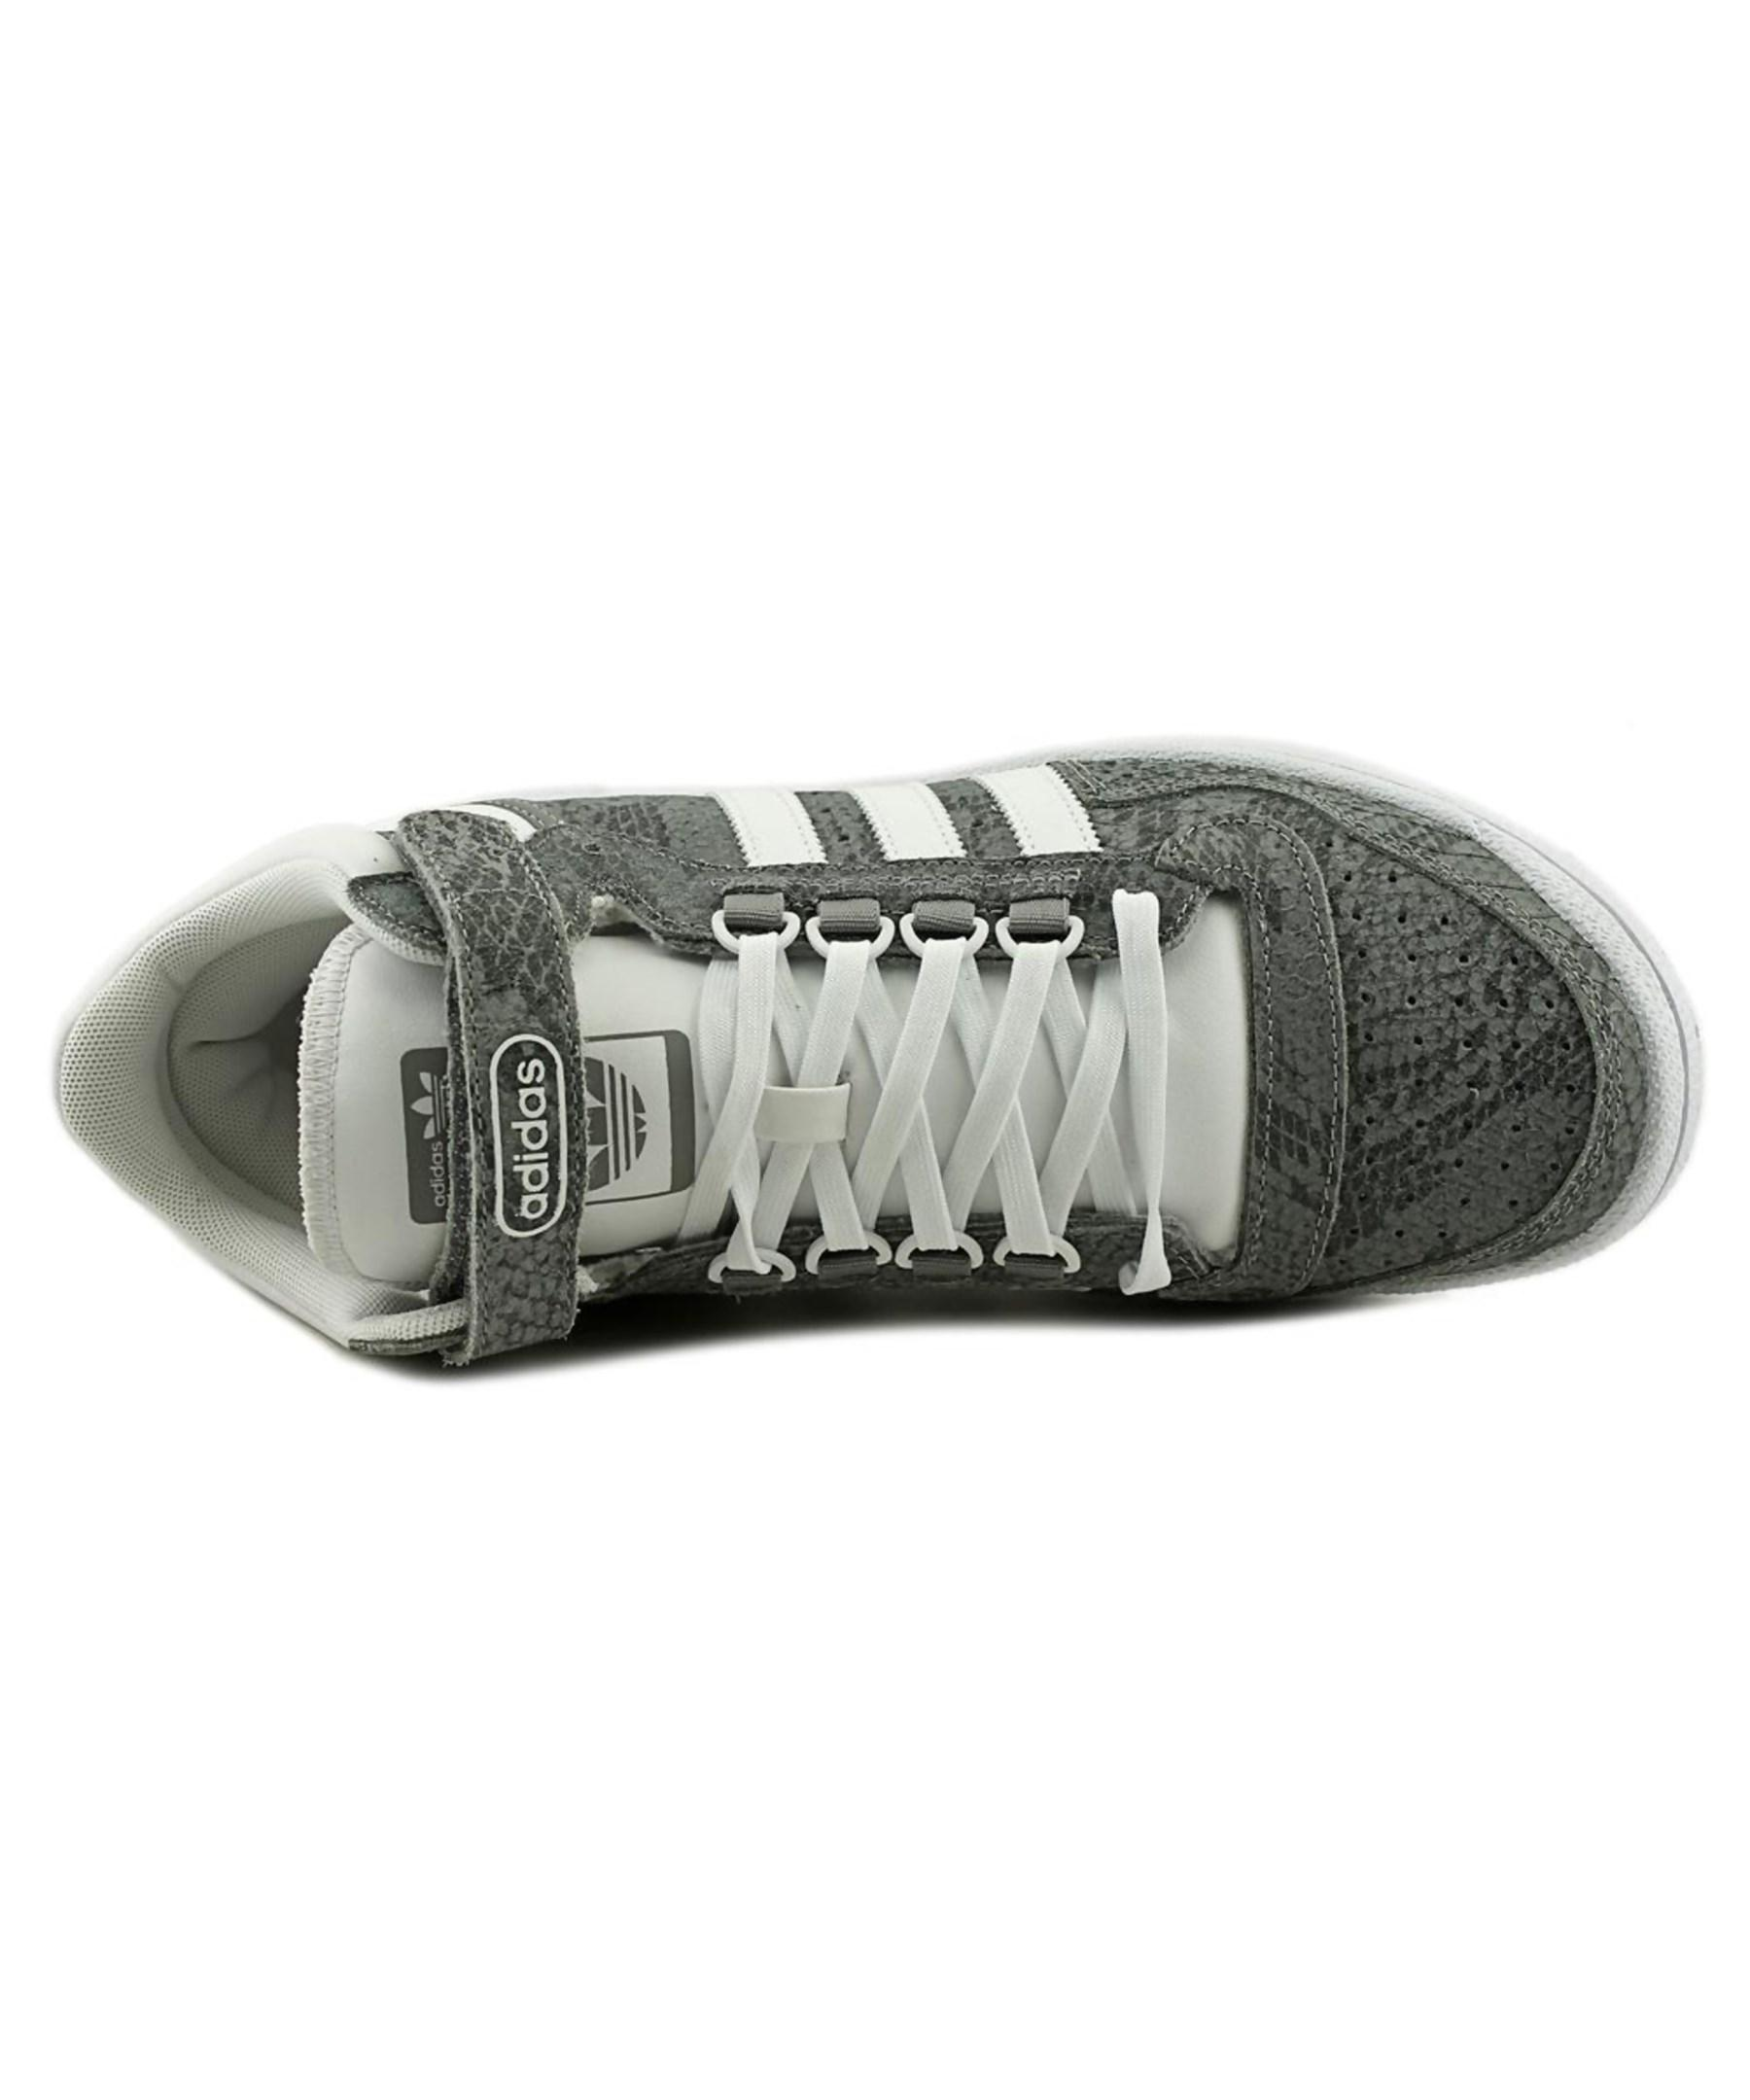 online retailer a8f26 af827 Lyst - Adidas Originals Concord 2.0 Mid Men Round Toe Leathe